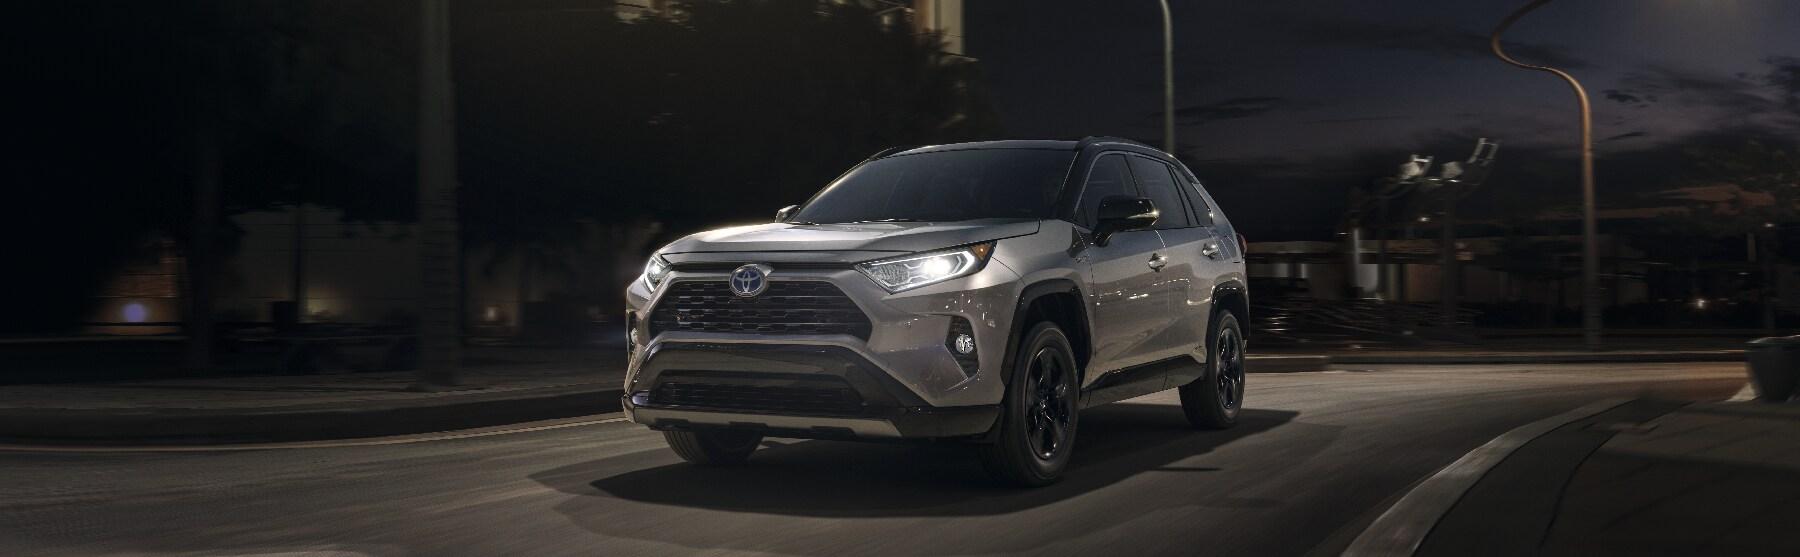 New 2019 Toyota Rav4 Hybrid For Sale In Silver Spring